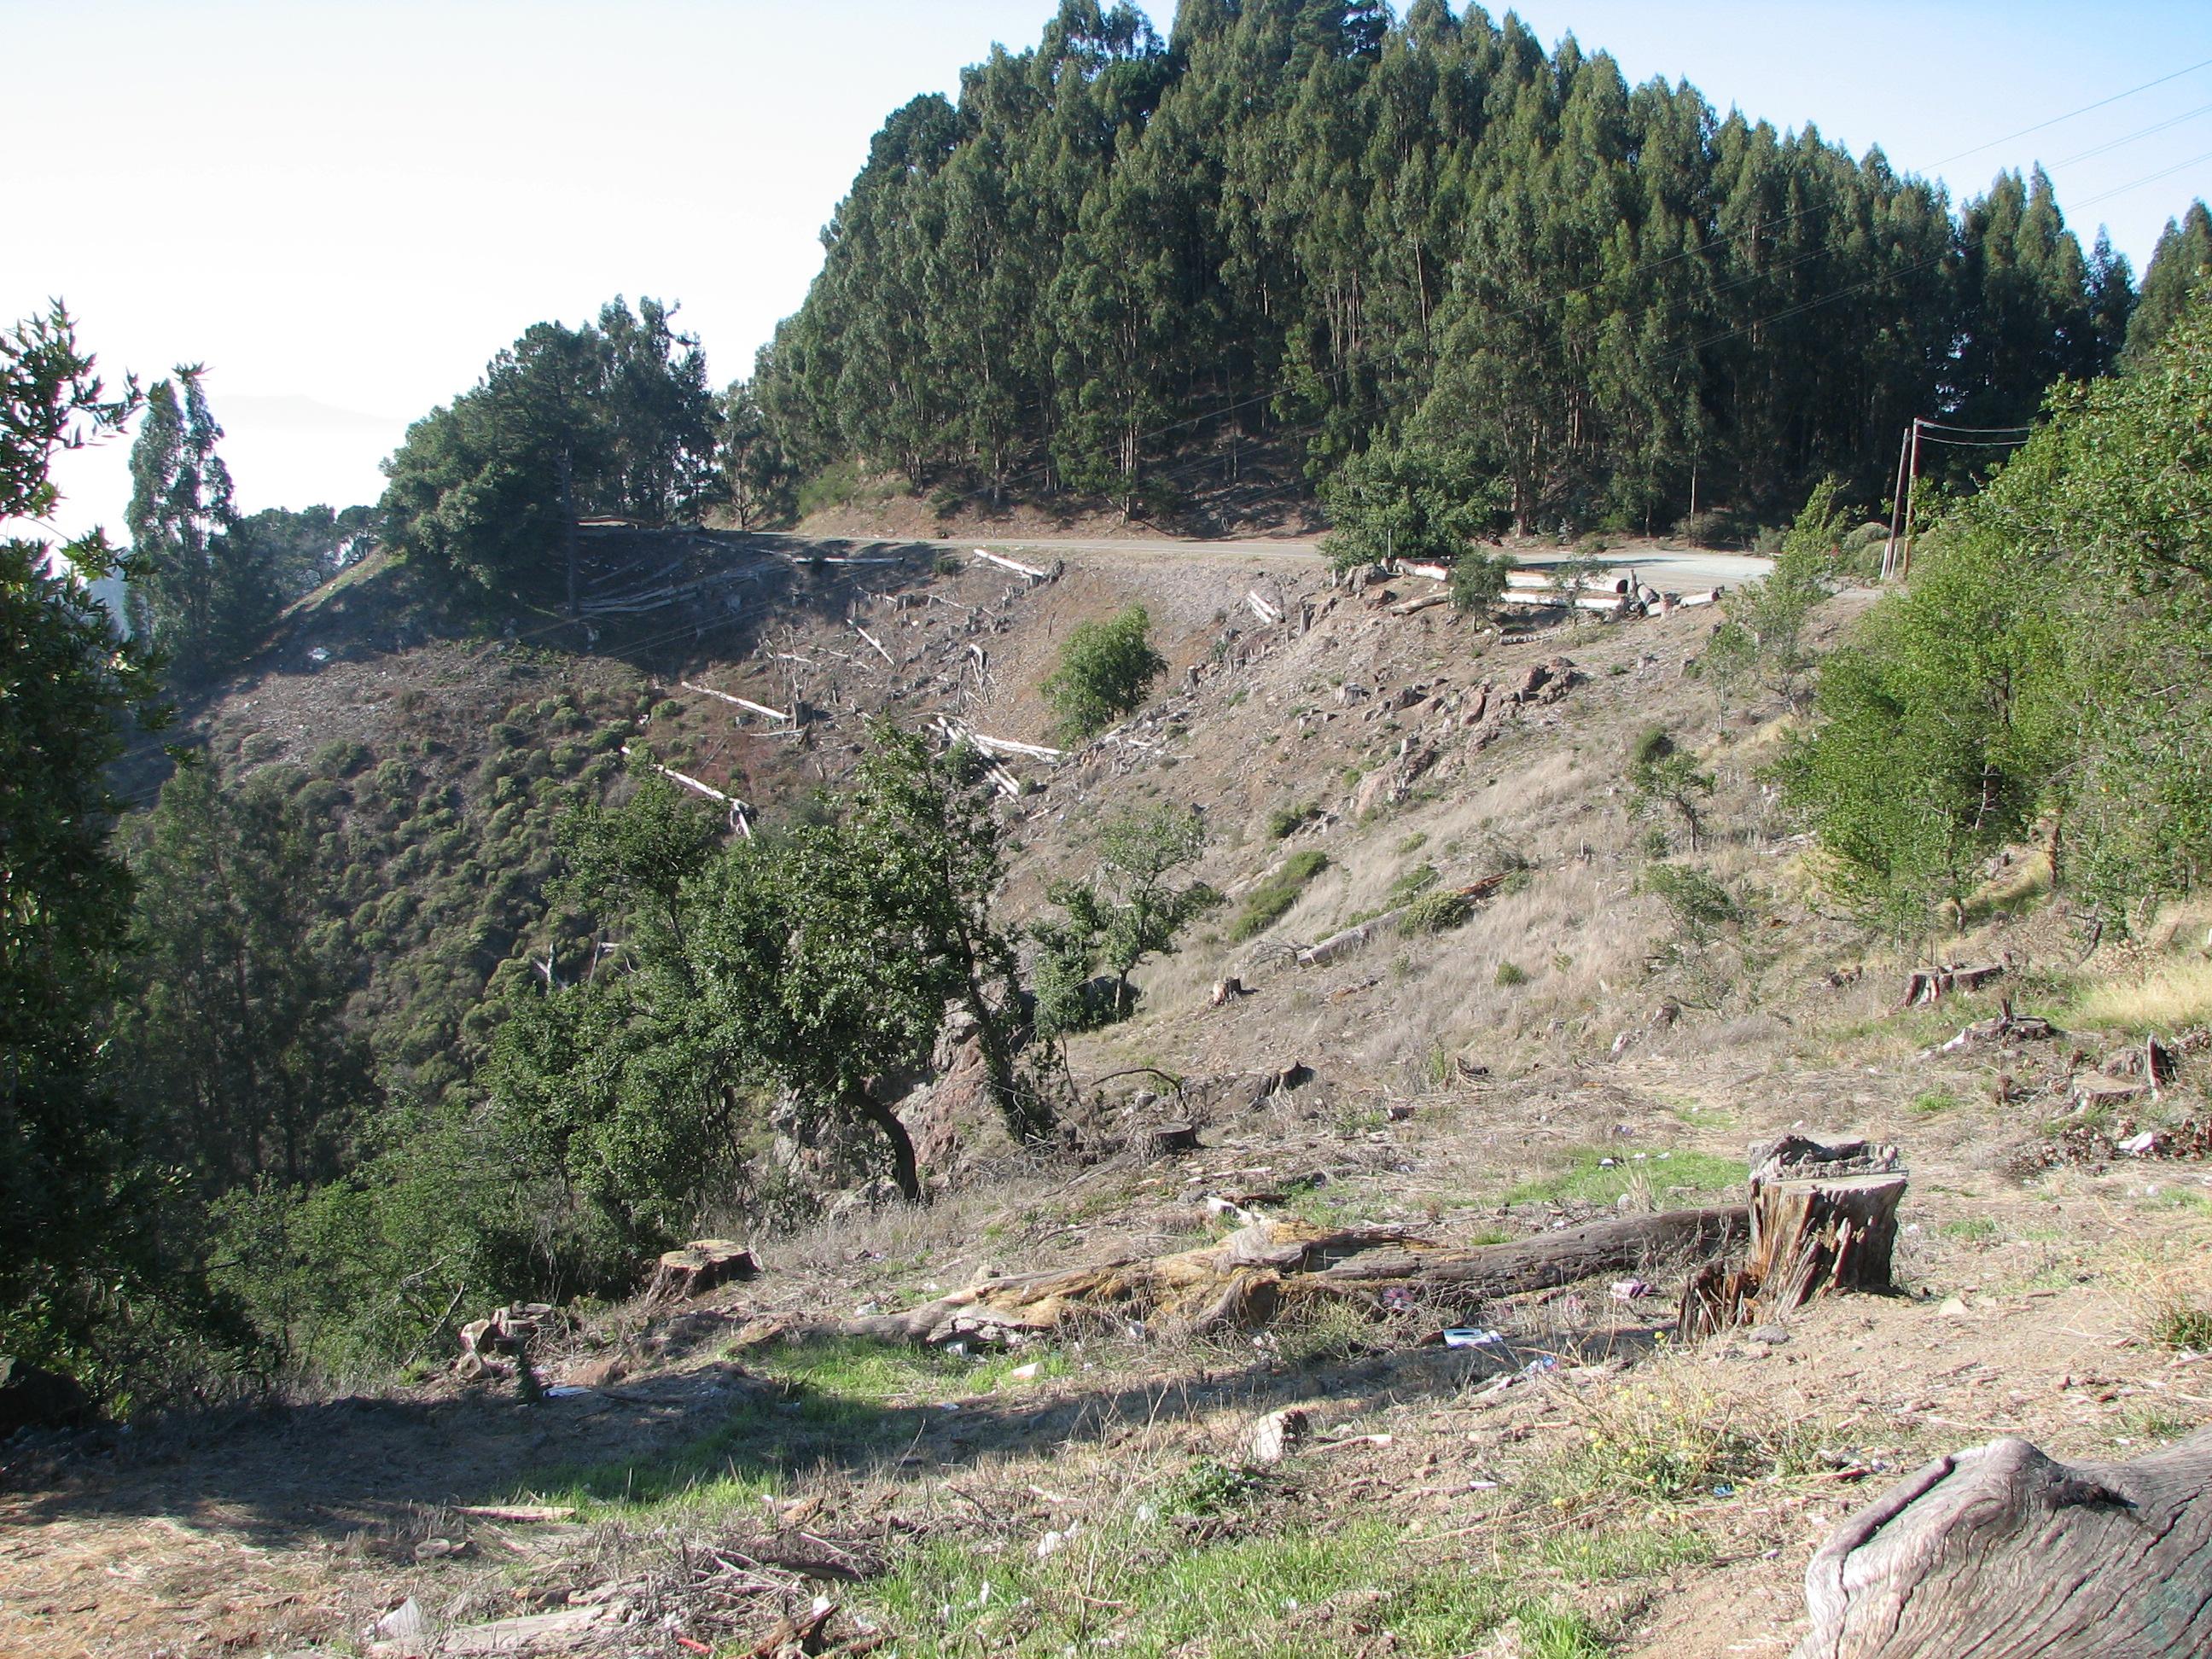 Saving Trees From Needless